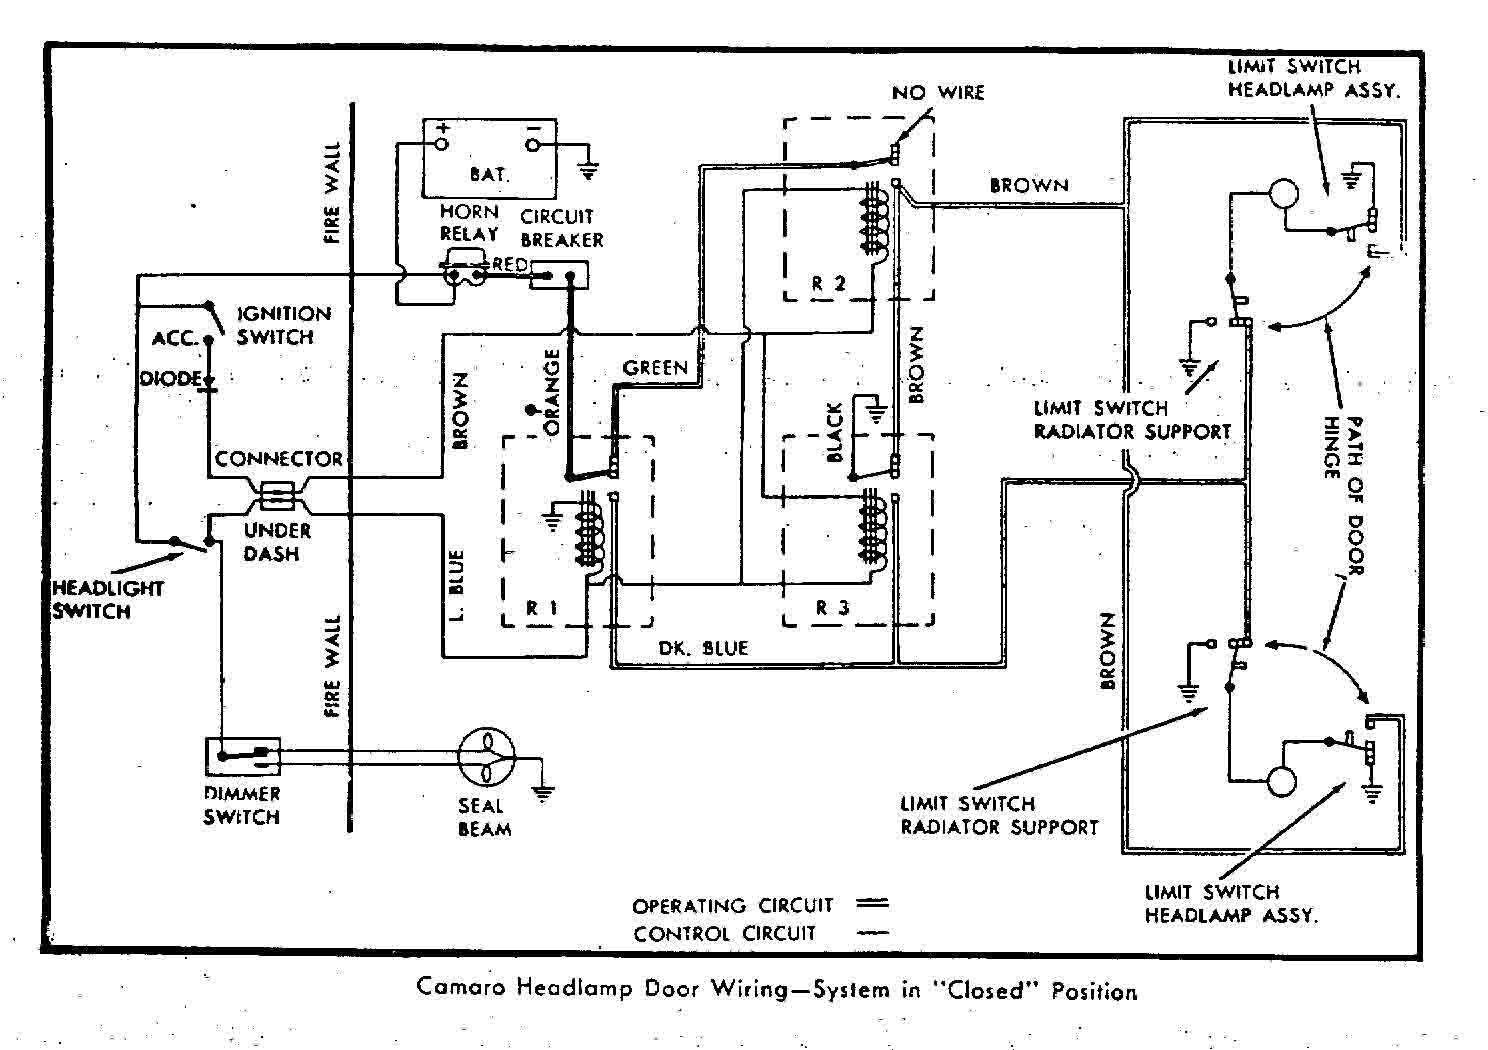 Tremendous 1967 Firebird Shifter Wiring Diagram Wiring Diagram Data Schema Wiring Cloud Ymoonsalvmohammedshrineorg